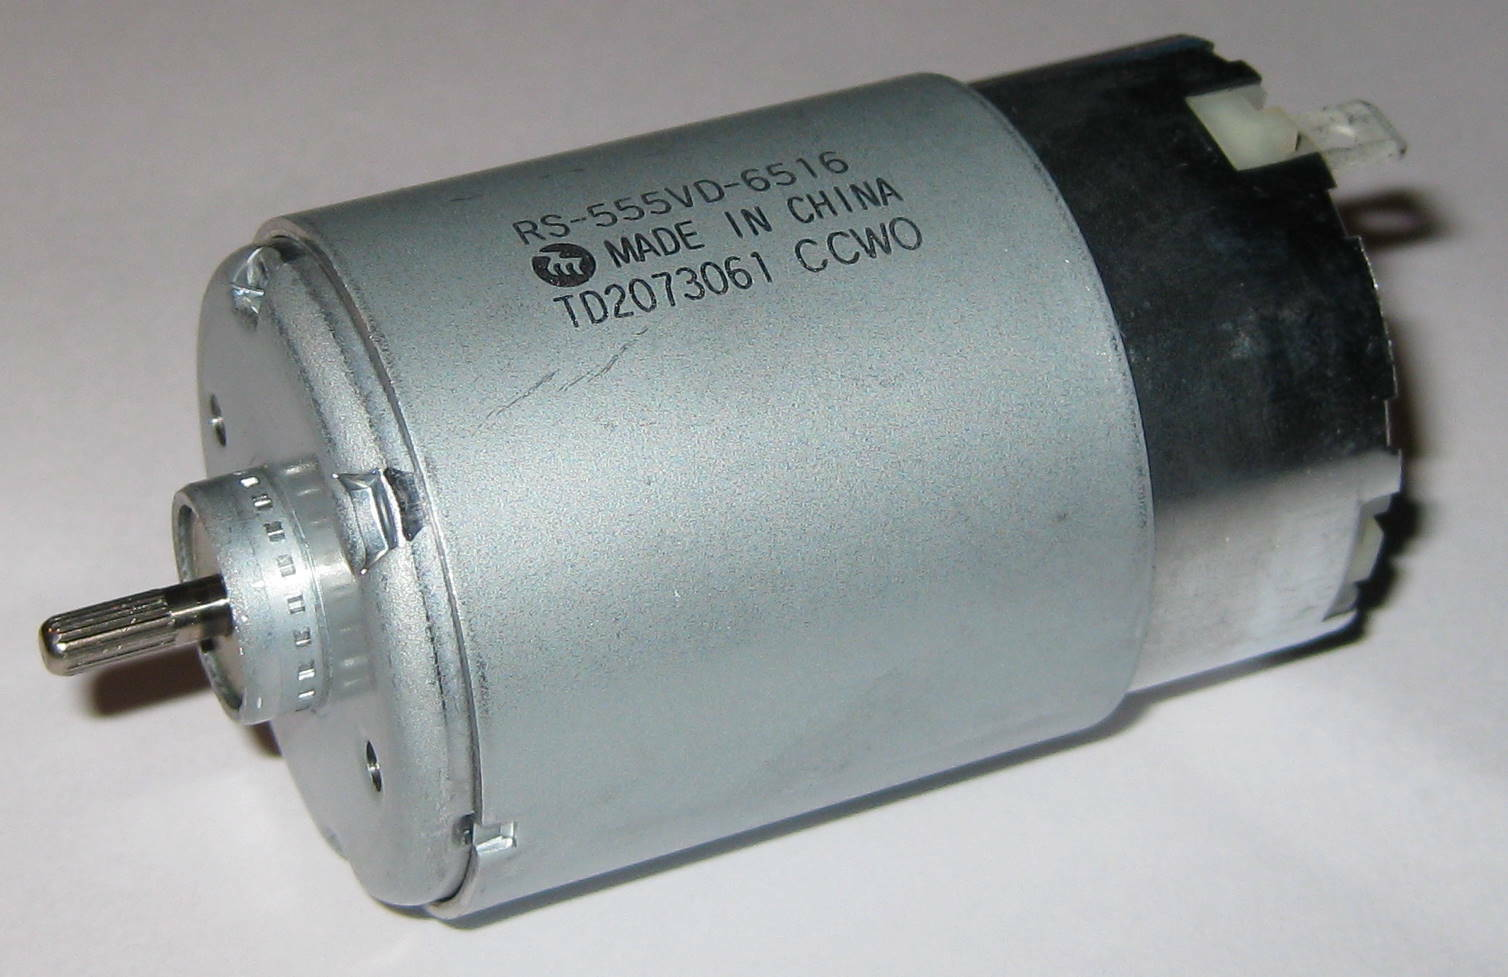 Mabuchi rs 555 vd 12v 13500 rpm high torque motor for 12v motors high torque